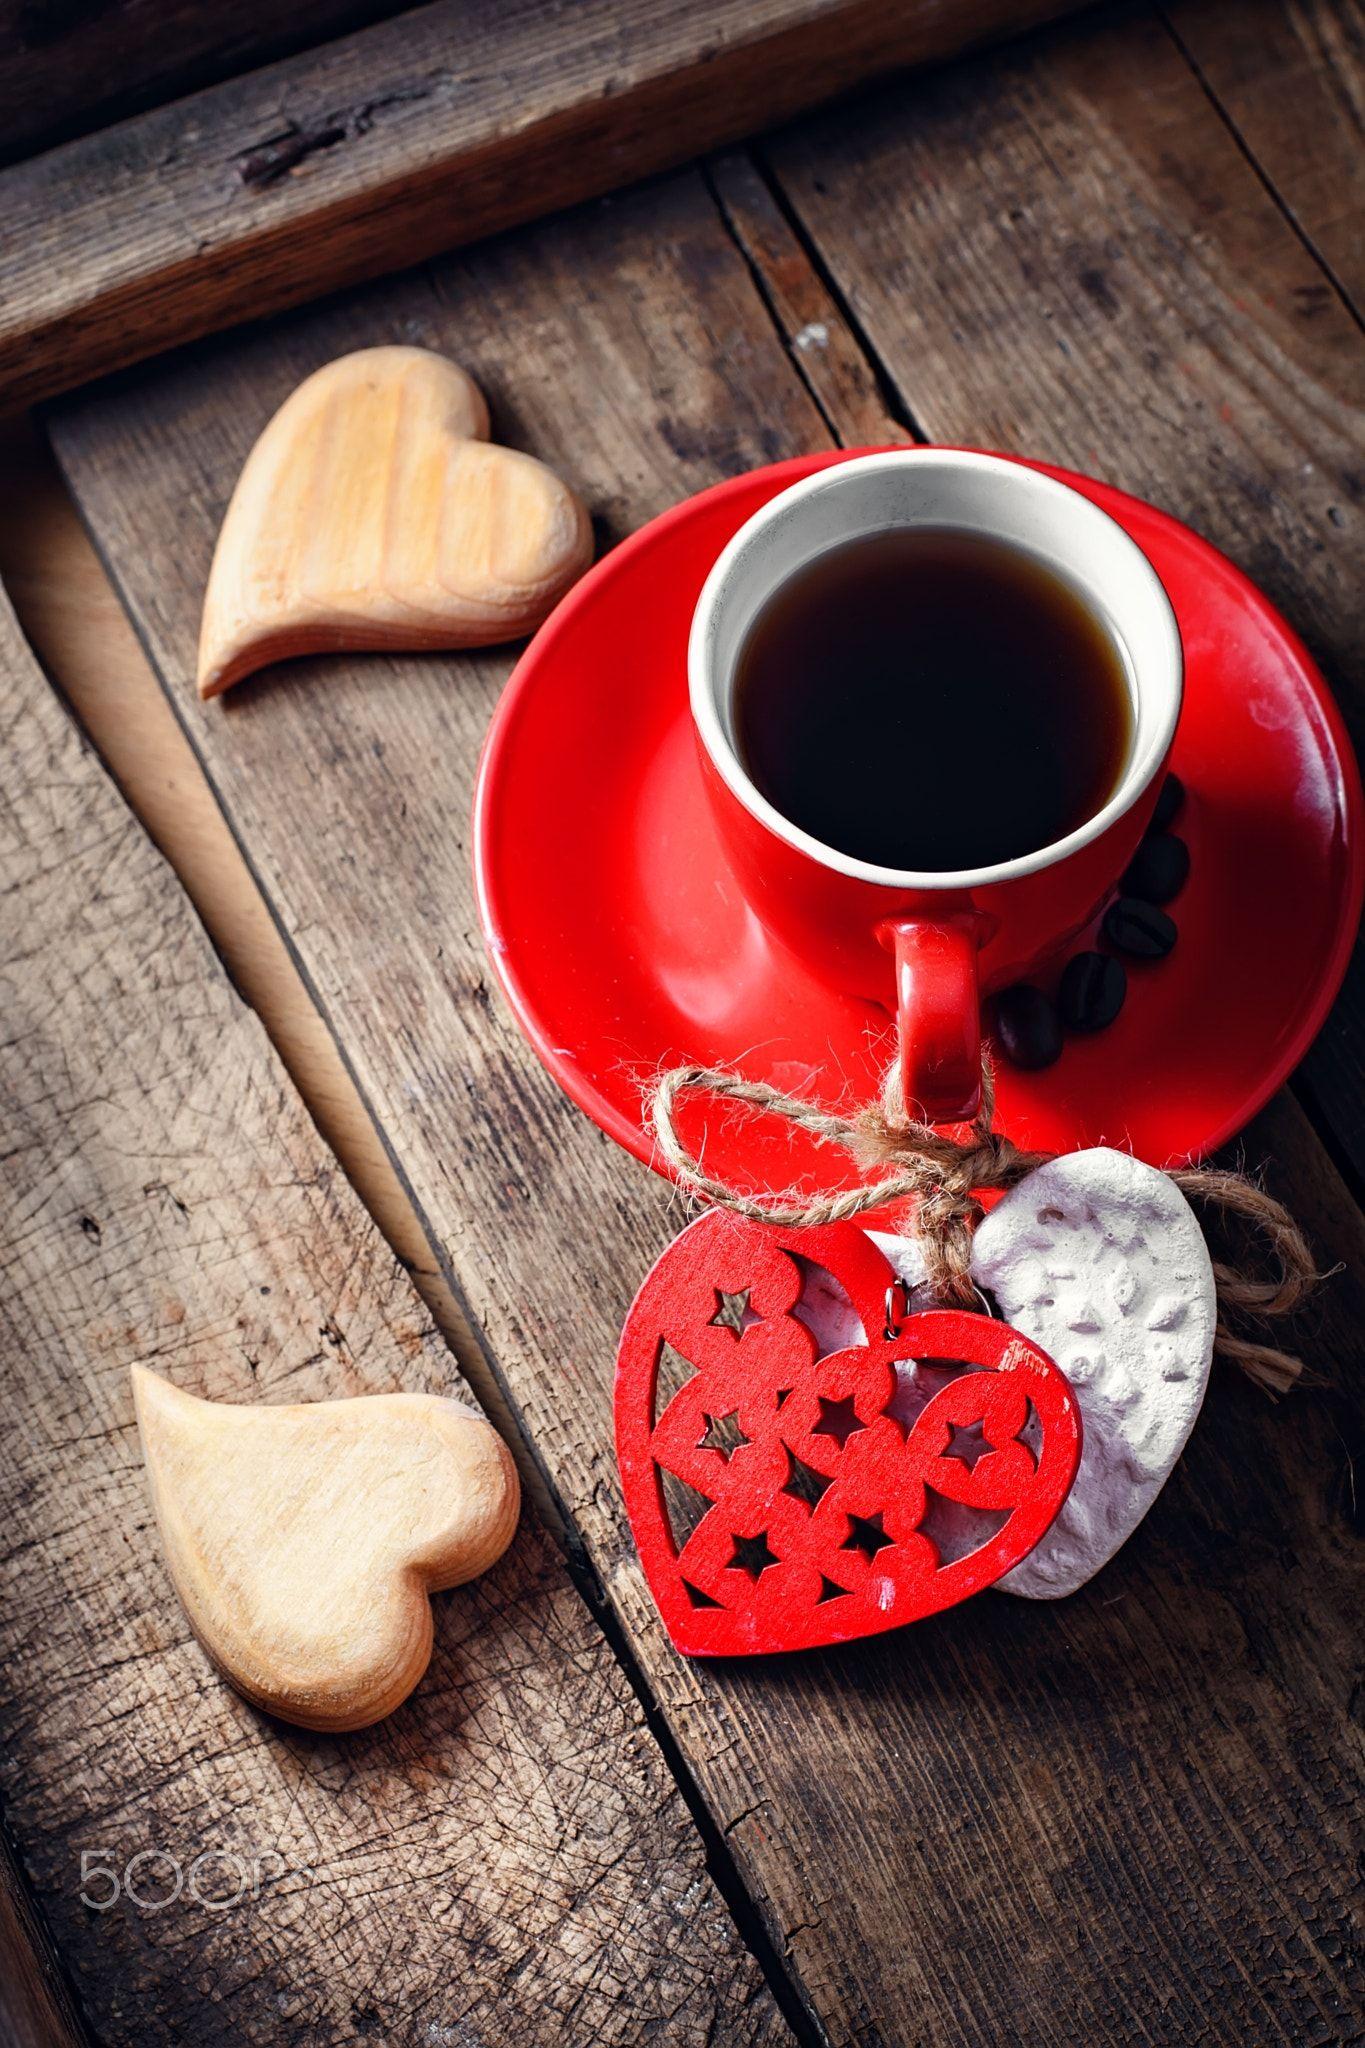 Macchina Caffè Saeco Immagini